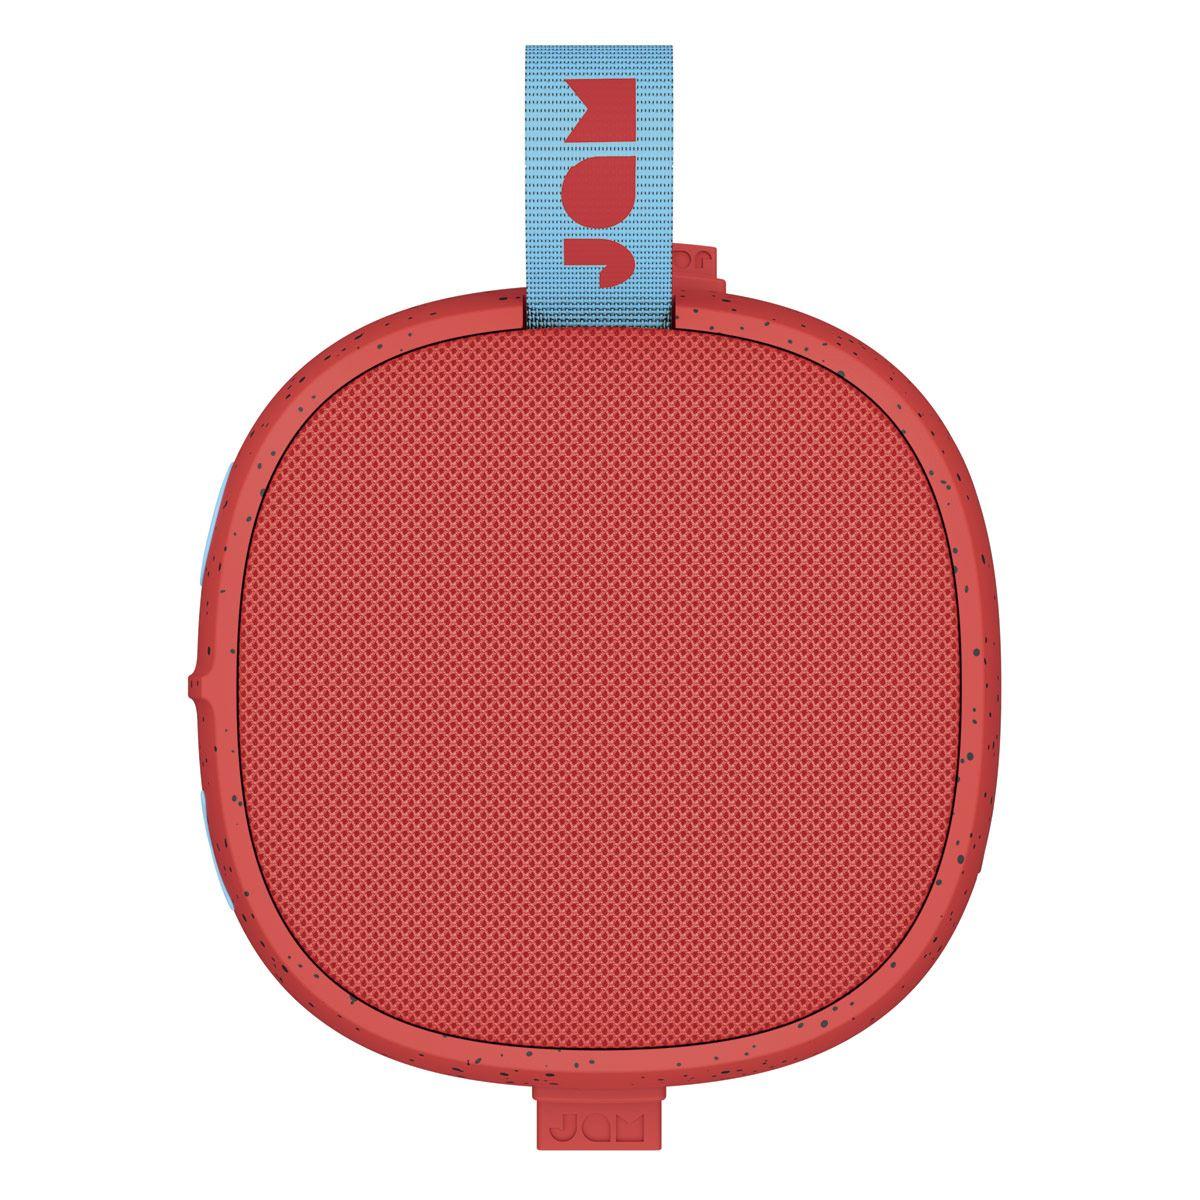 Bocina JAM Hang Up Resistente al Agua Roja